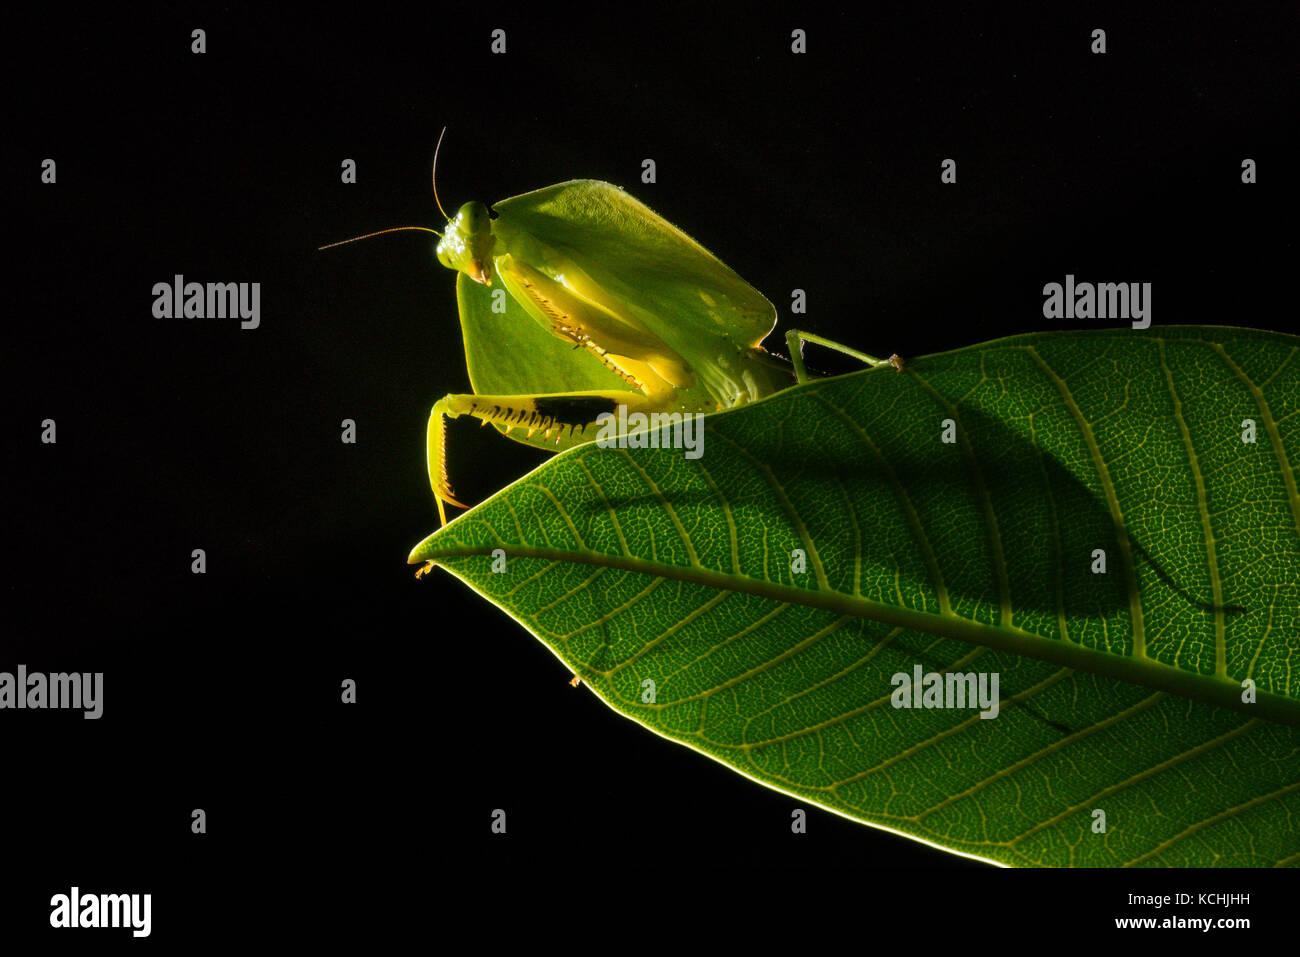 A Sheild mantis (Choeradodis sp.) on a leaf at night, Ecuador - Stock Image